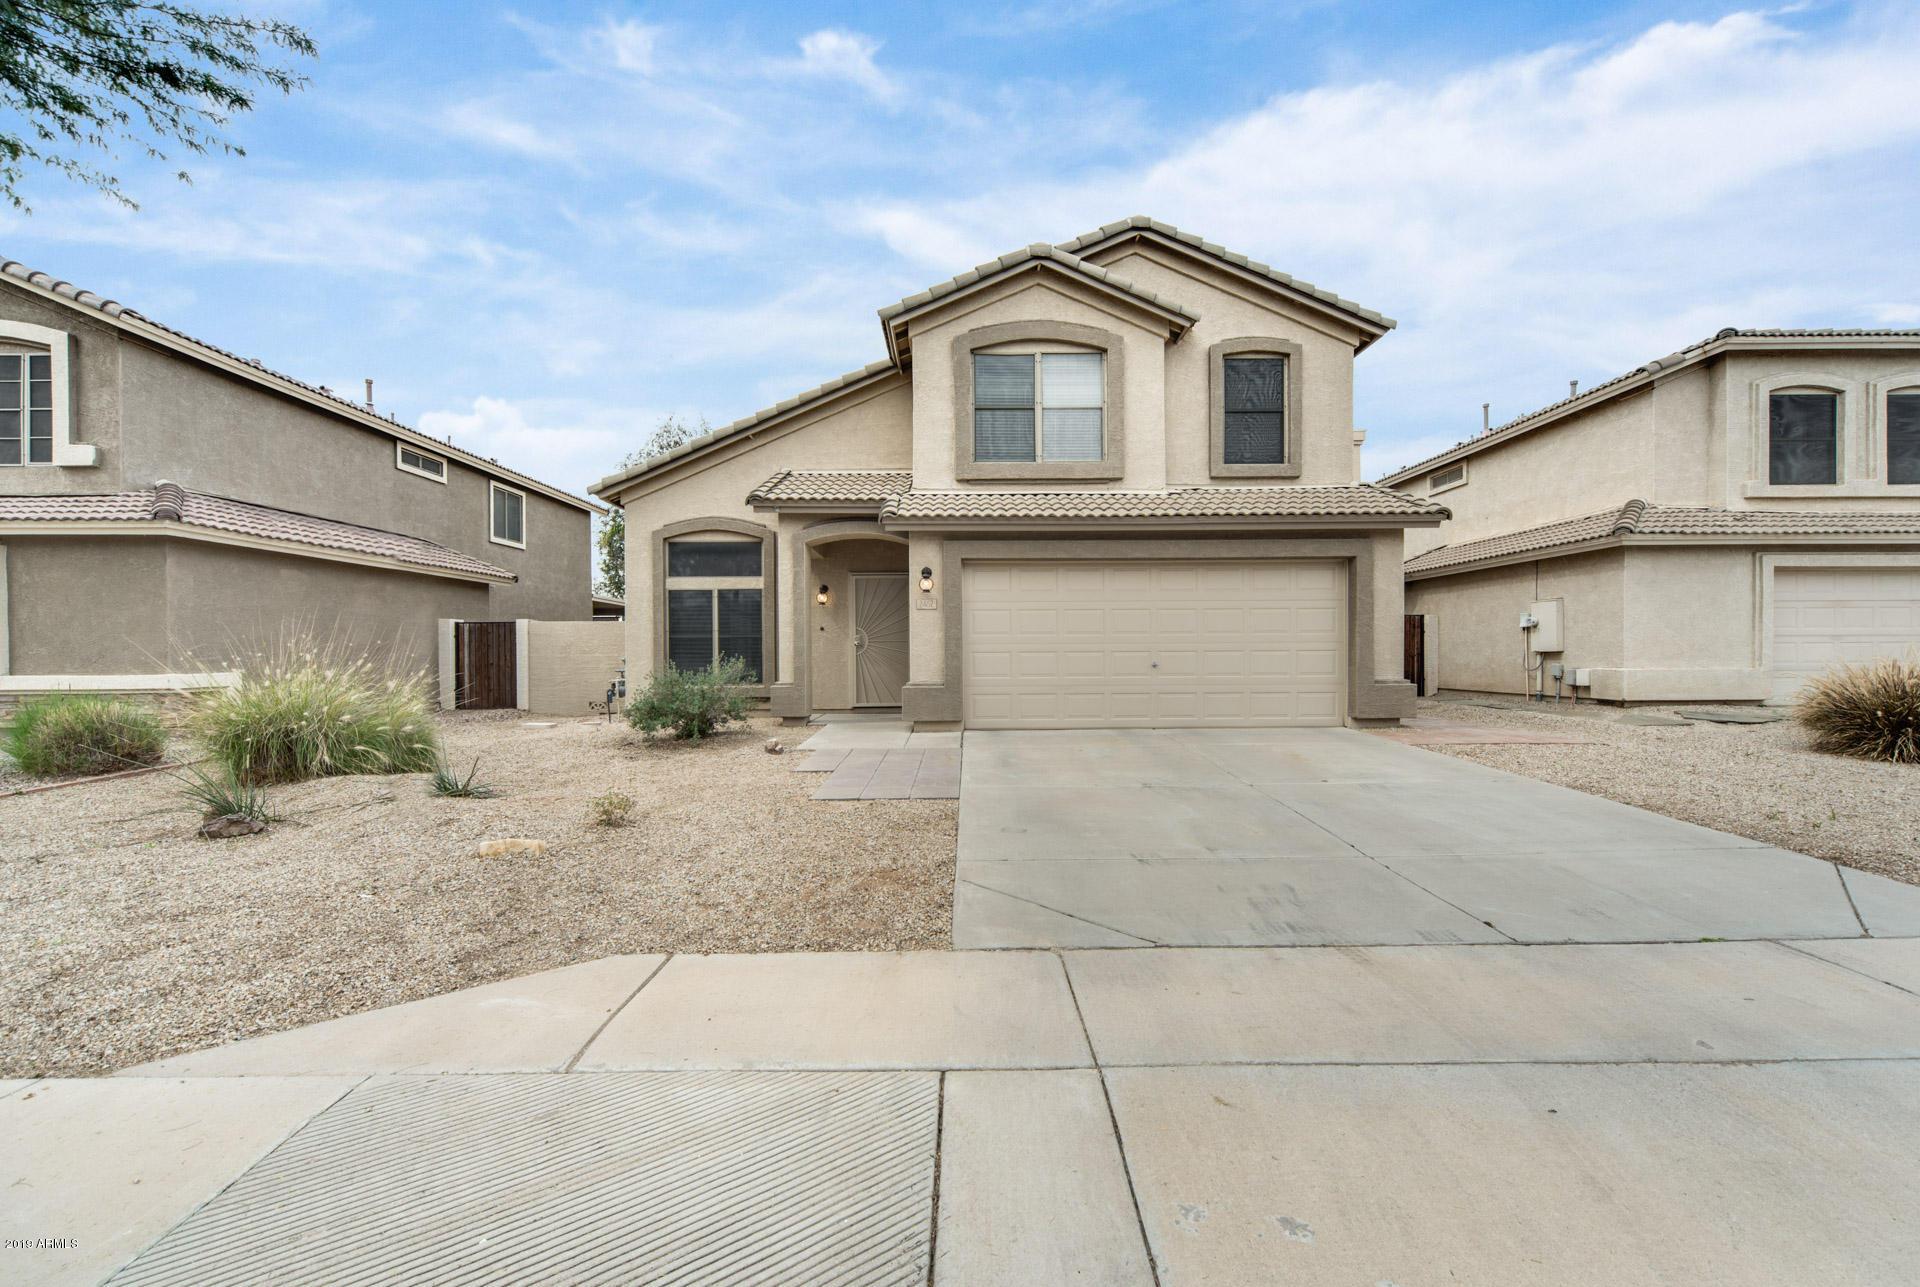 Photo of 2462 S LYNCH Avenue, Mesa, AZ 85209